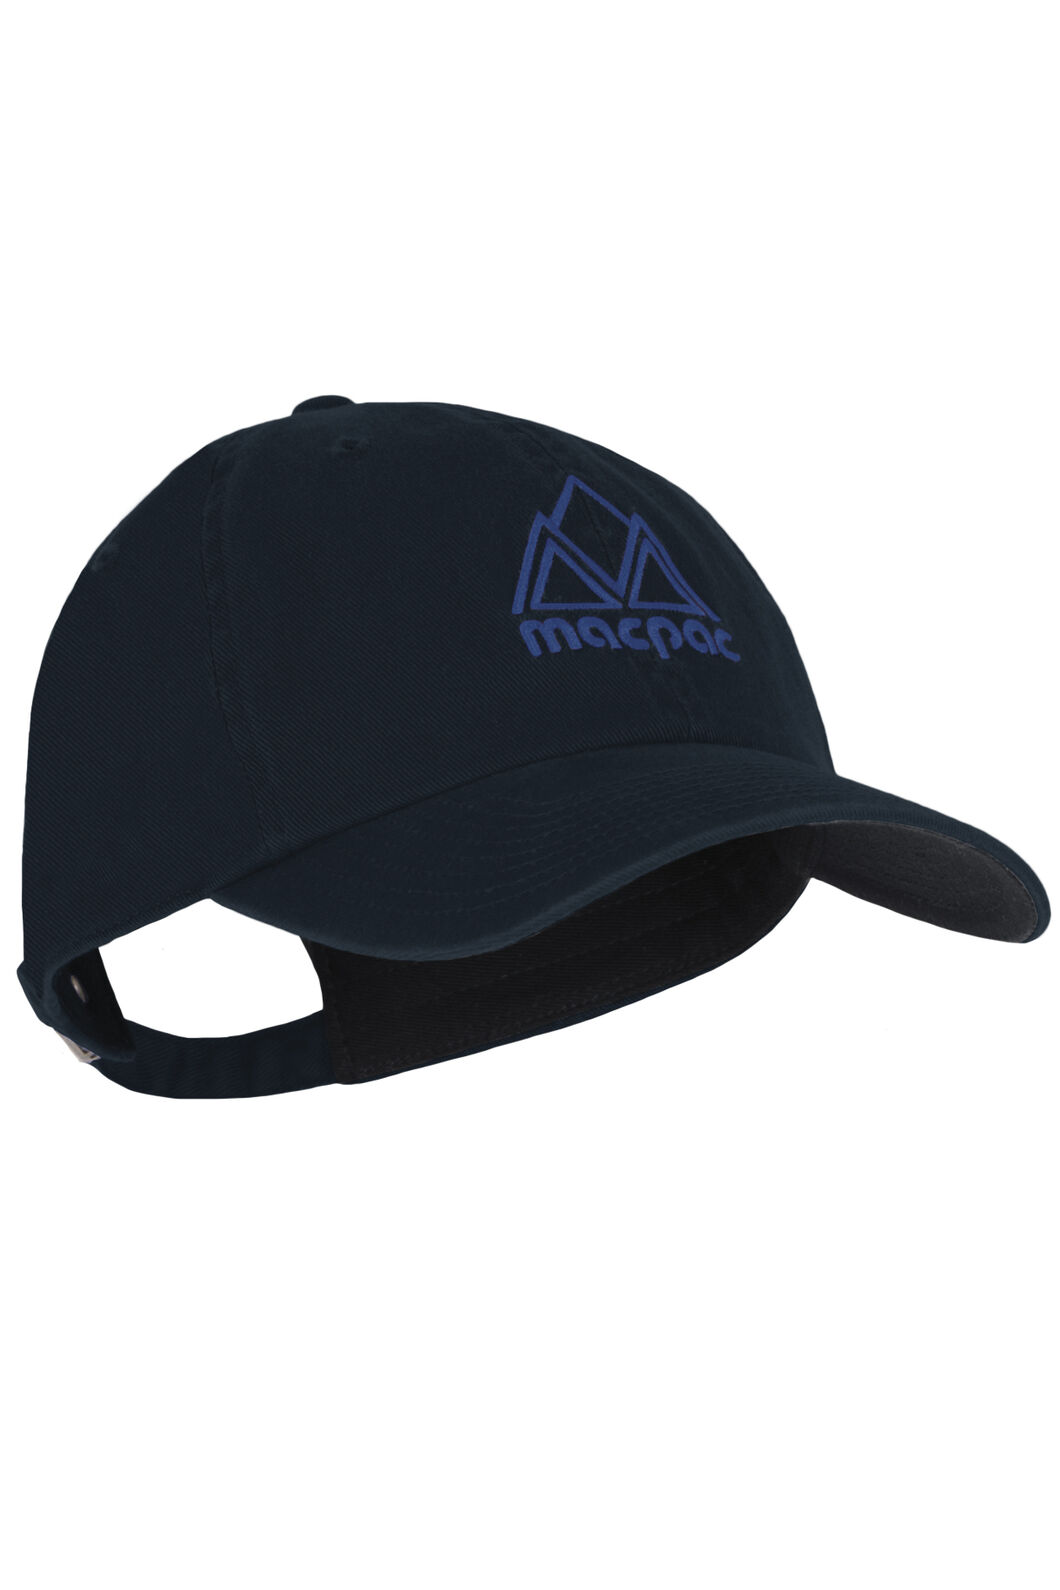 Vintage Cap, Carbon, hi-res